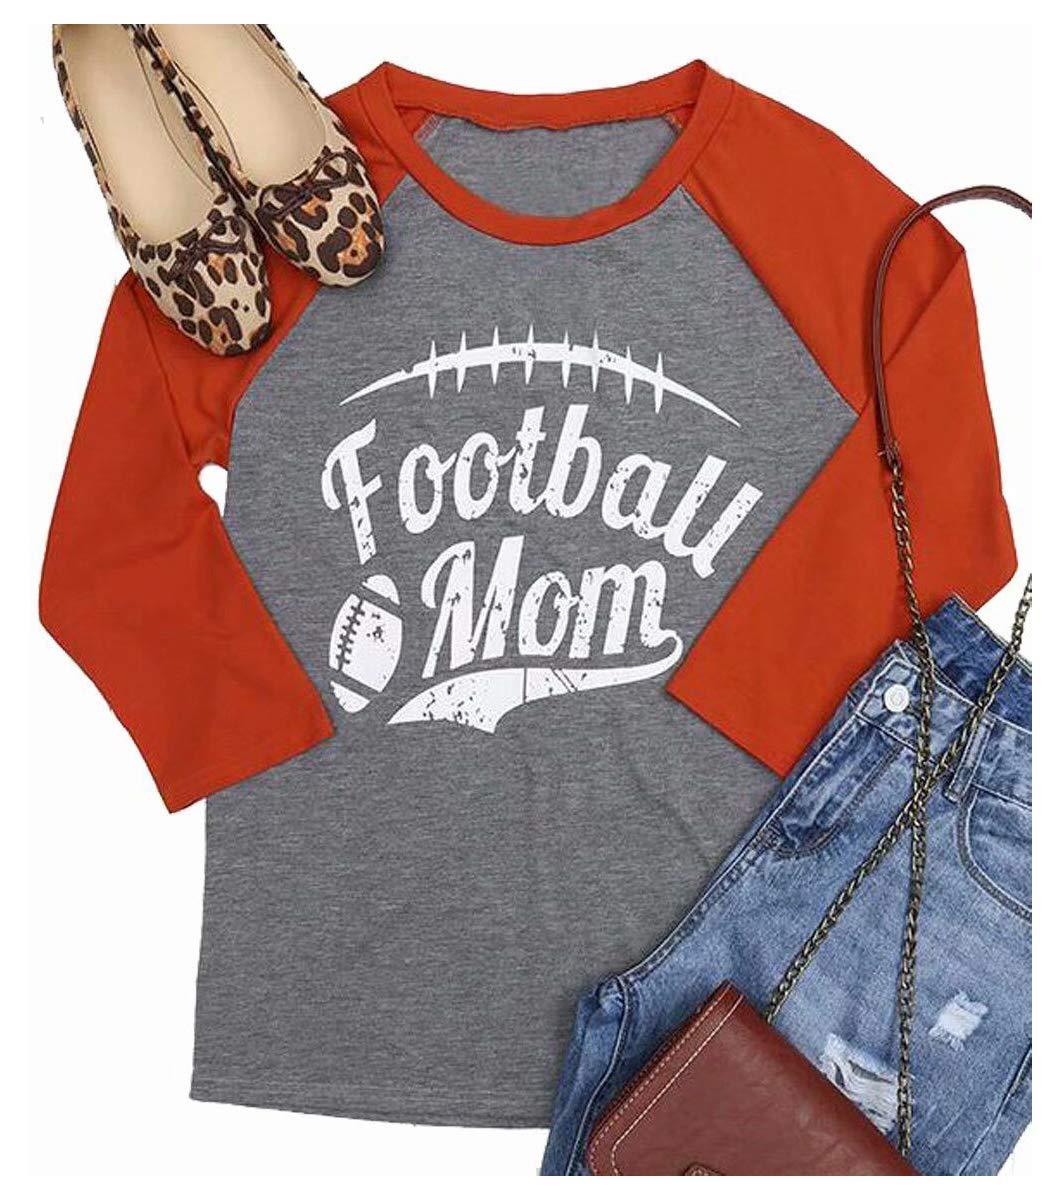 00b85f29 Football Mom Funny T-Shirt Women's Long Sleeve Raglan Baseball Tee Shirt  Softball Tops Size L (Orange)